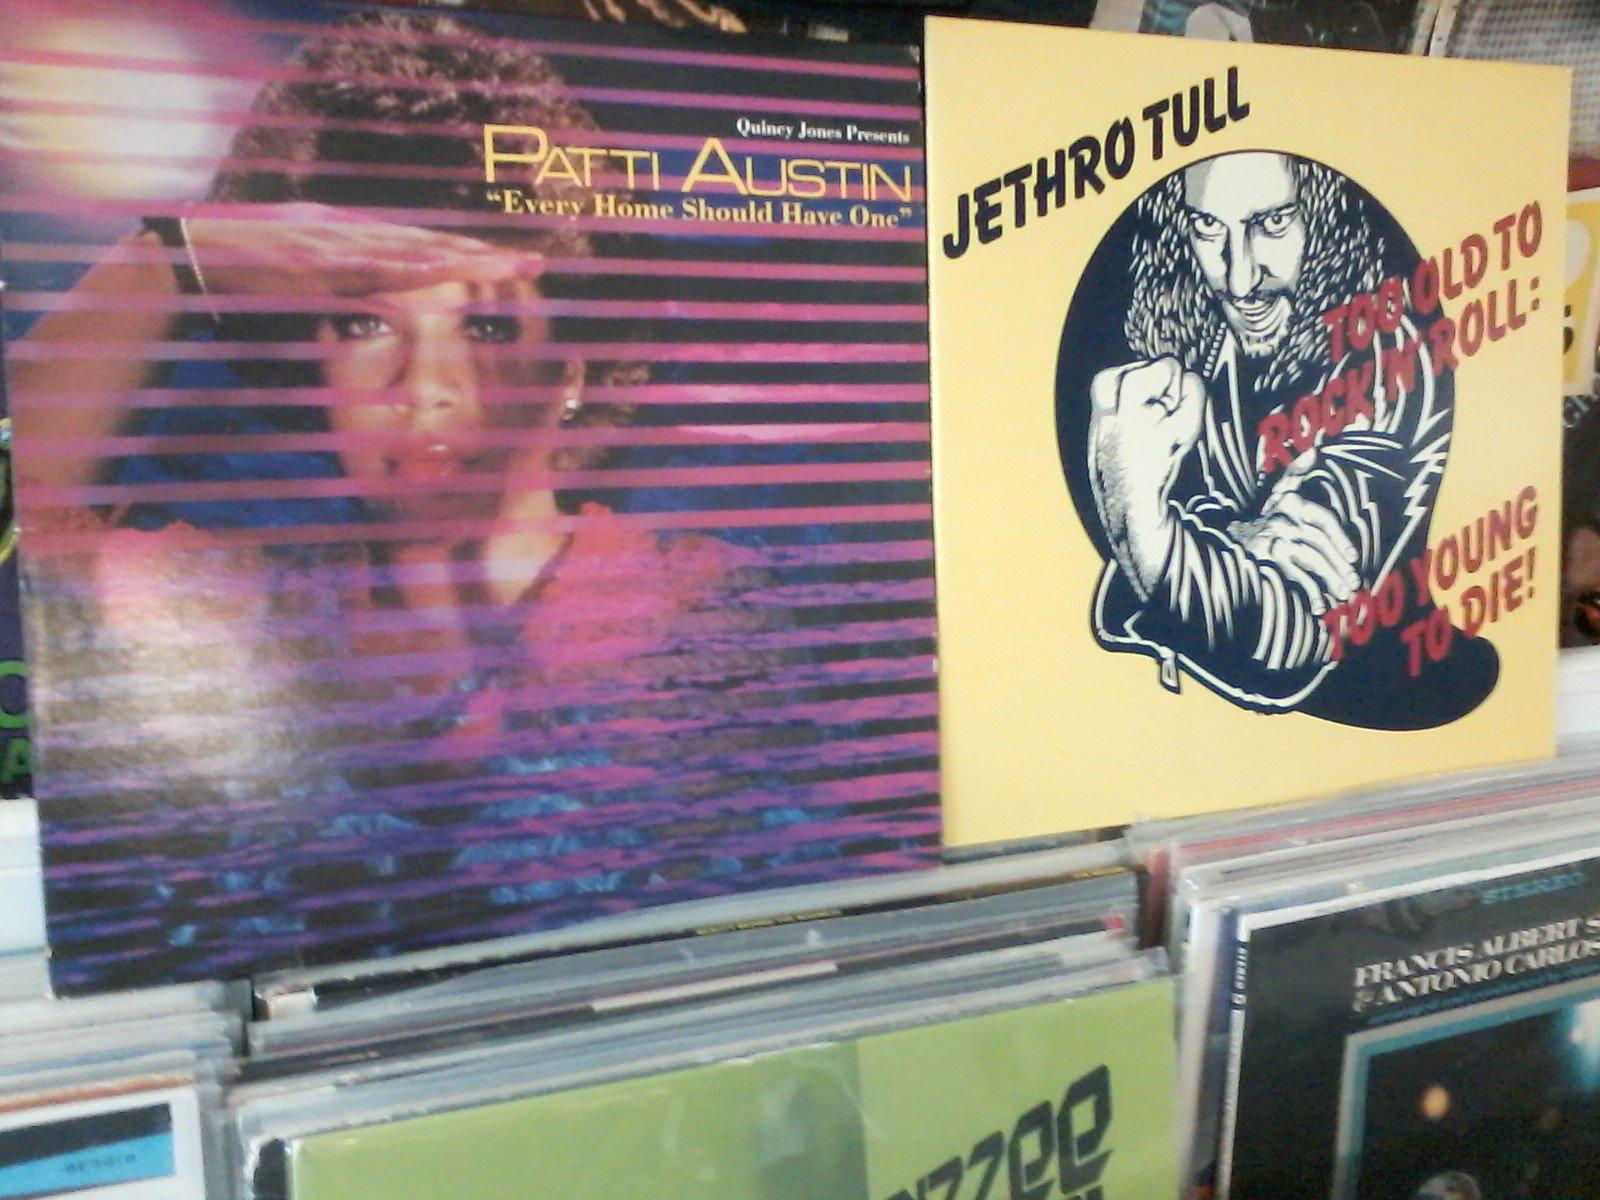 Happy Birthday to Patti Austin & Ian Anderson of Jethro Tull